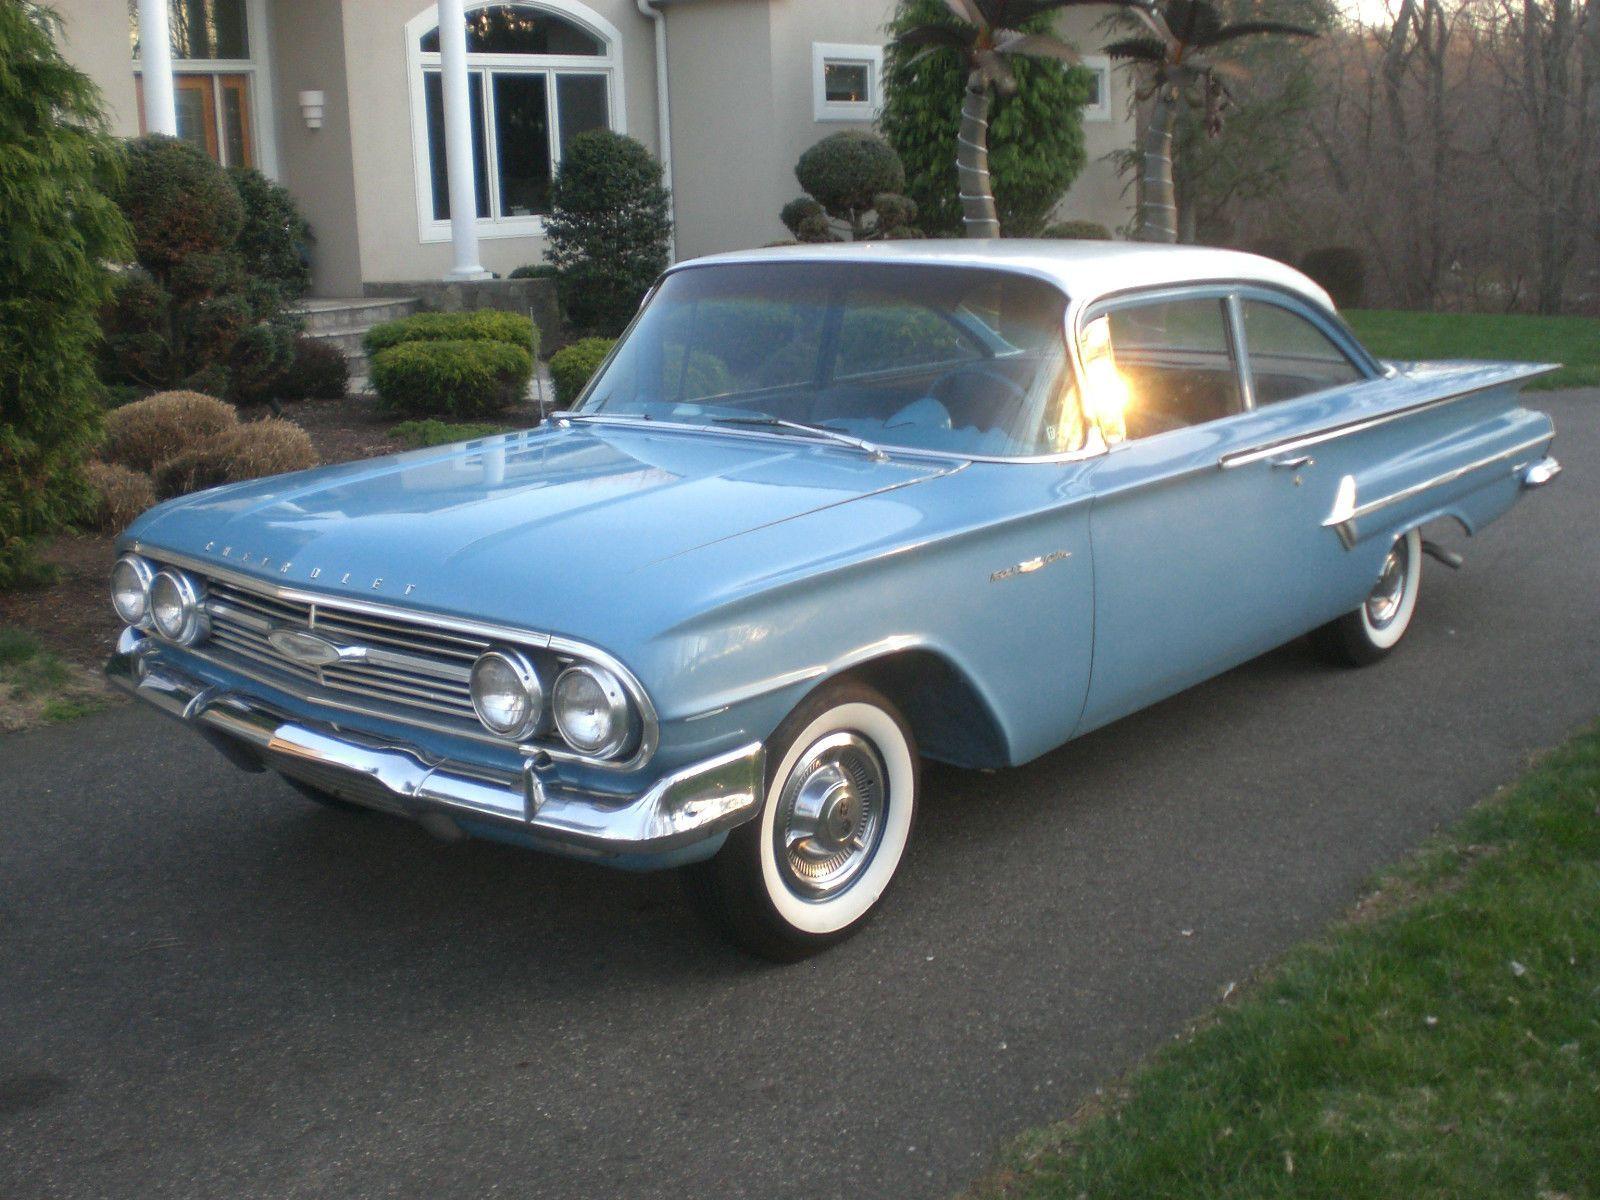 1960 chevrolet biscayne 2 door sedan maintenance restoration of old vintage vehicles